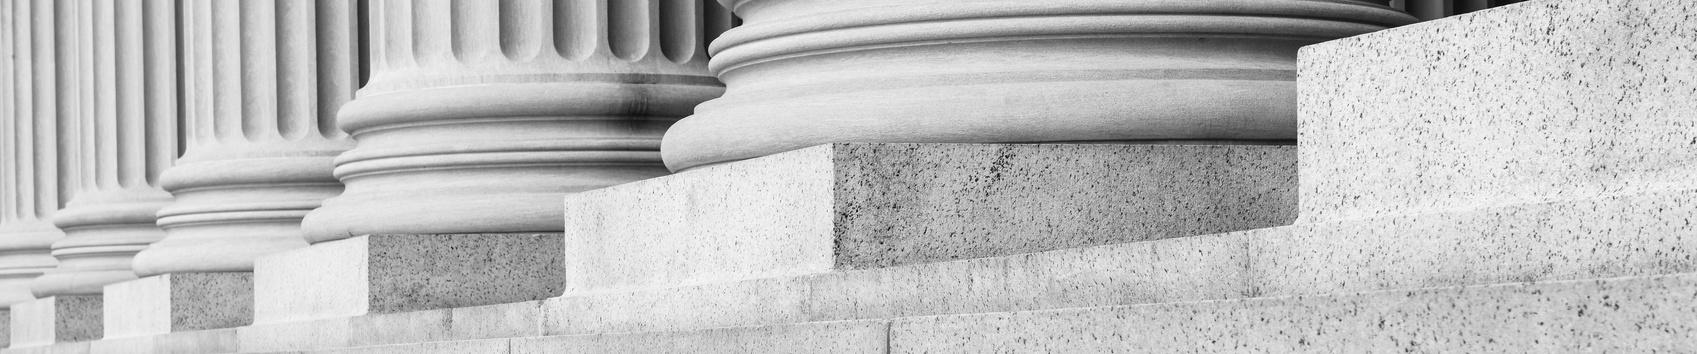 Cherniak Law, Internet, Libel, Slander and Copyright Law